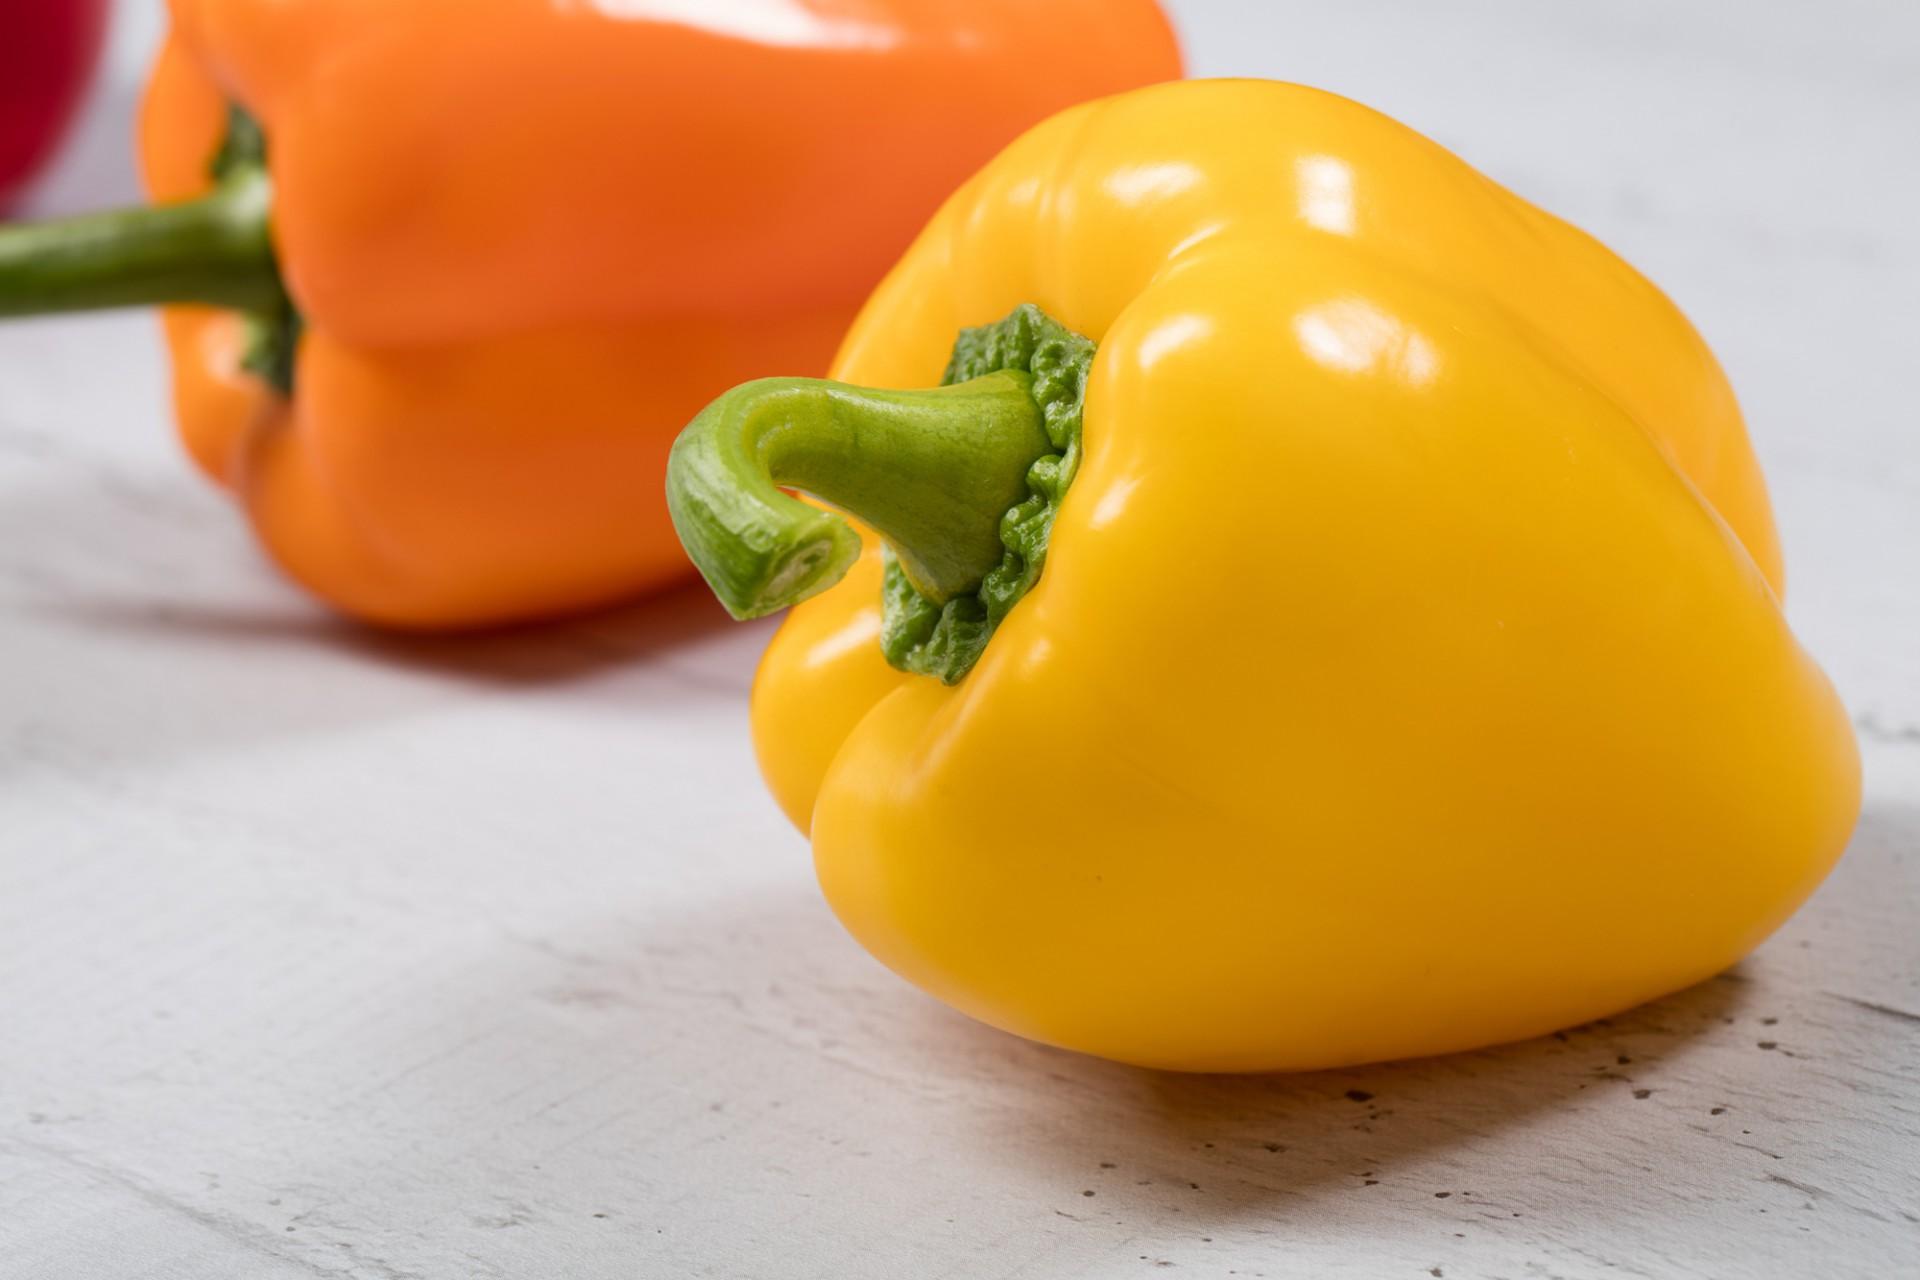 ERP leader 2 produce paprika